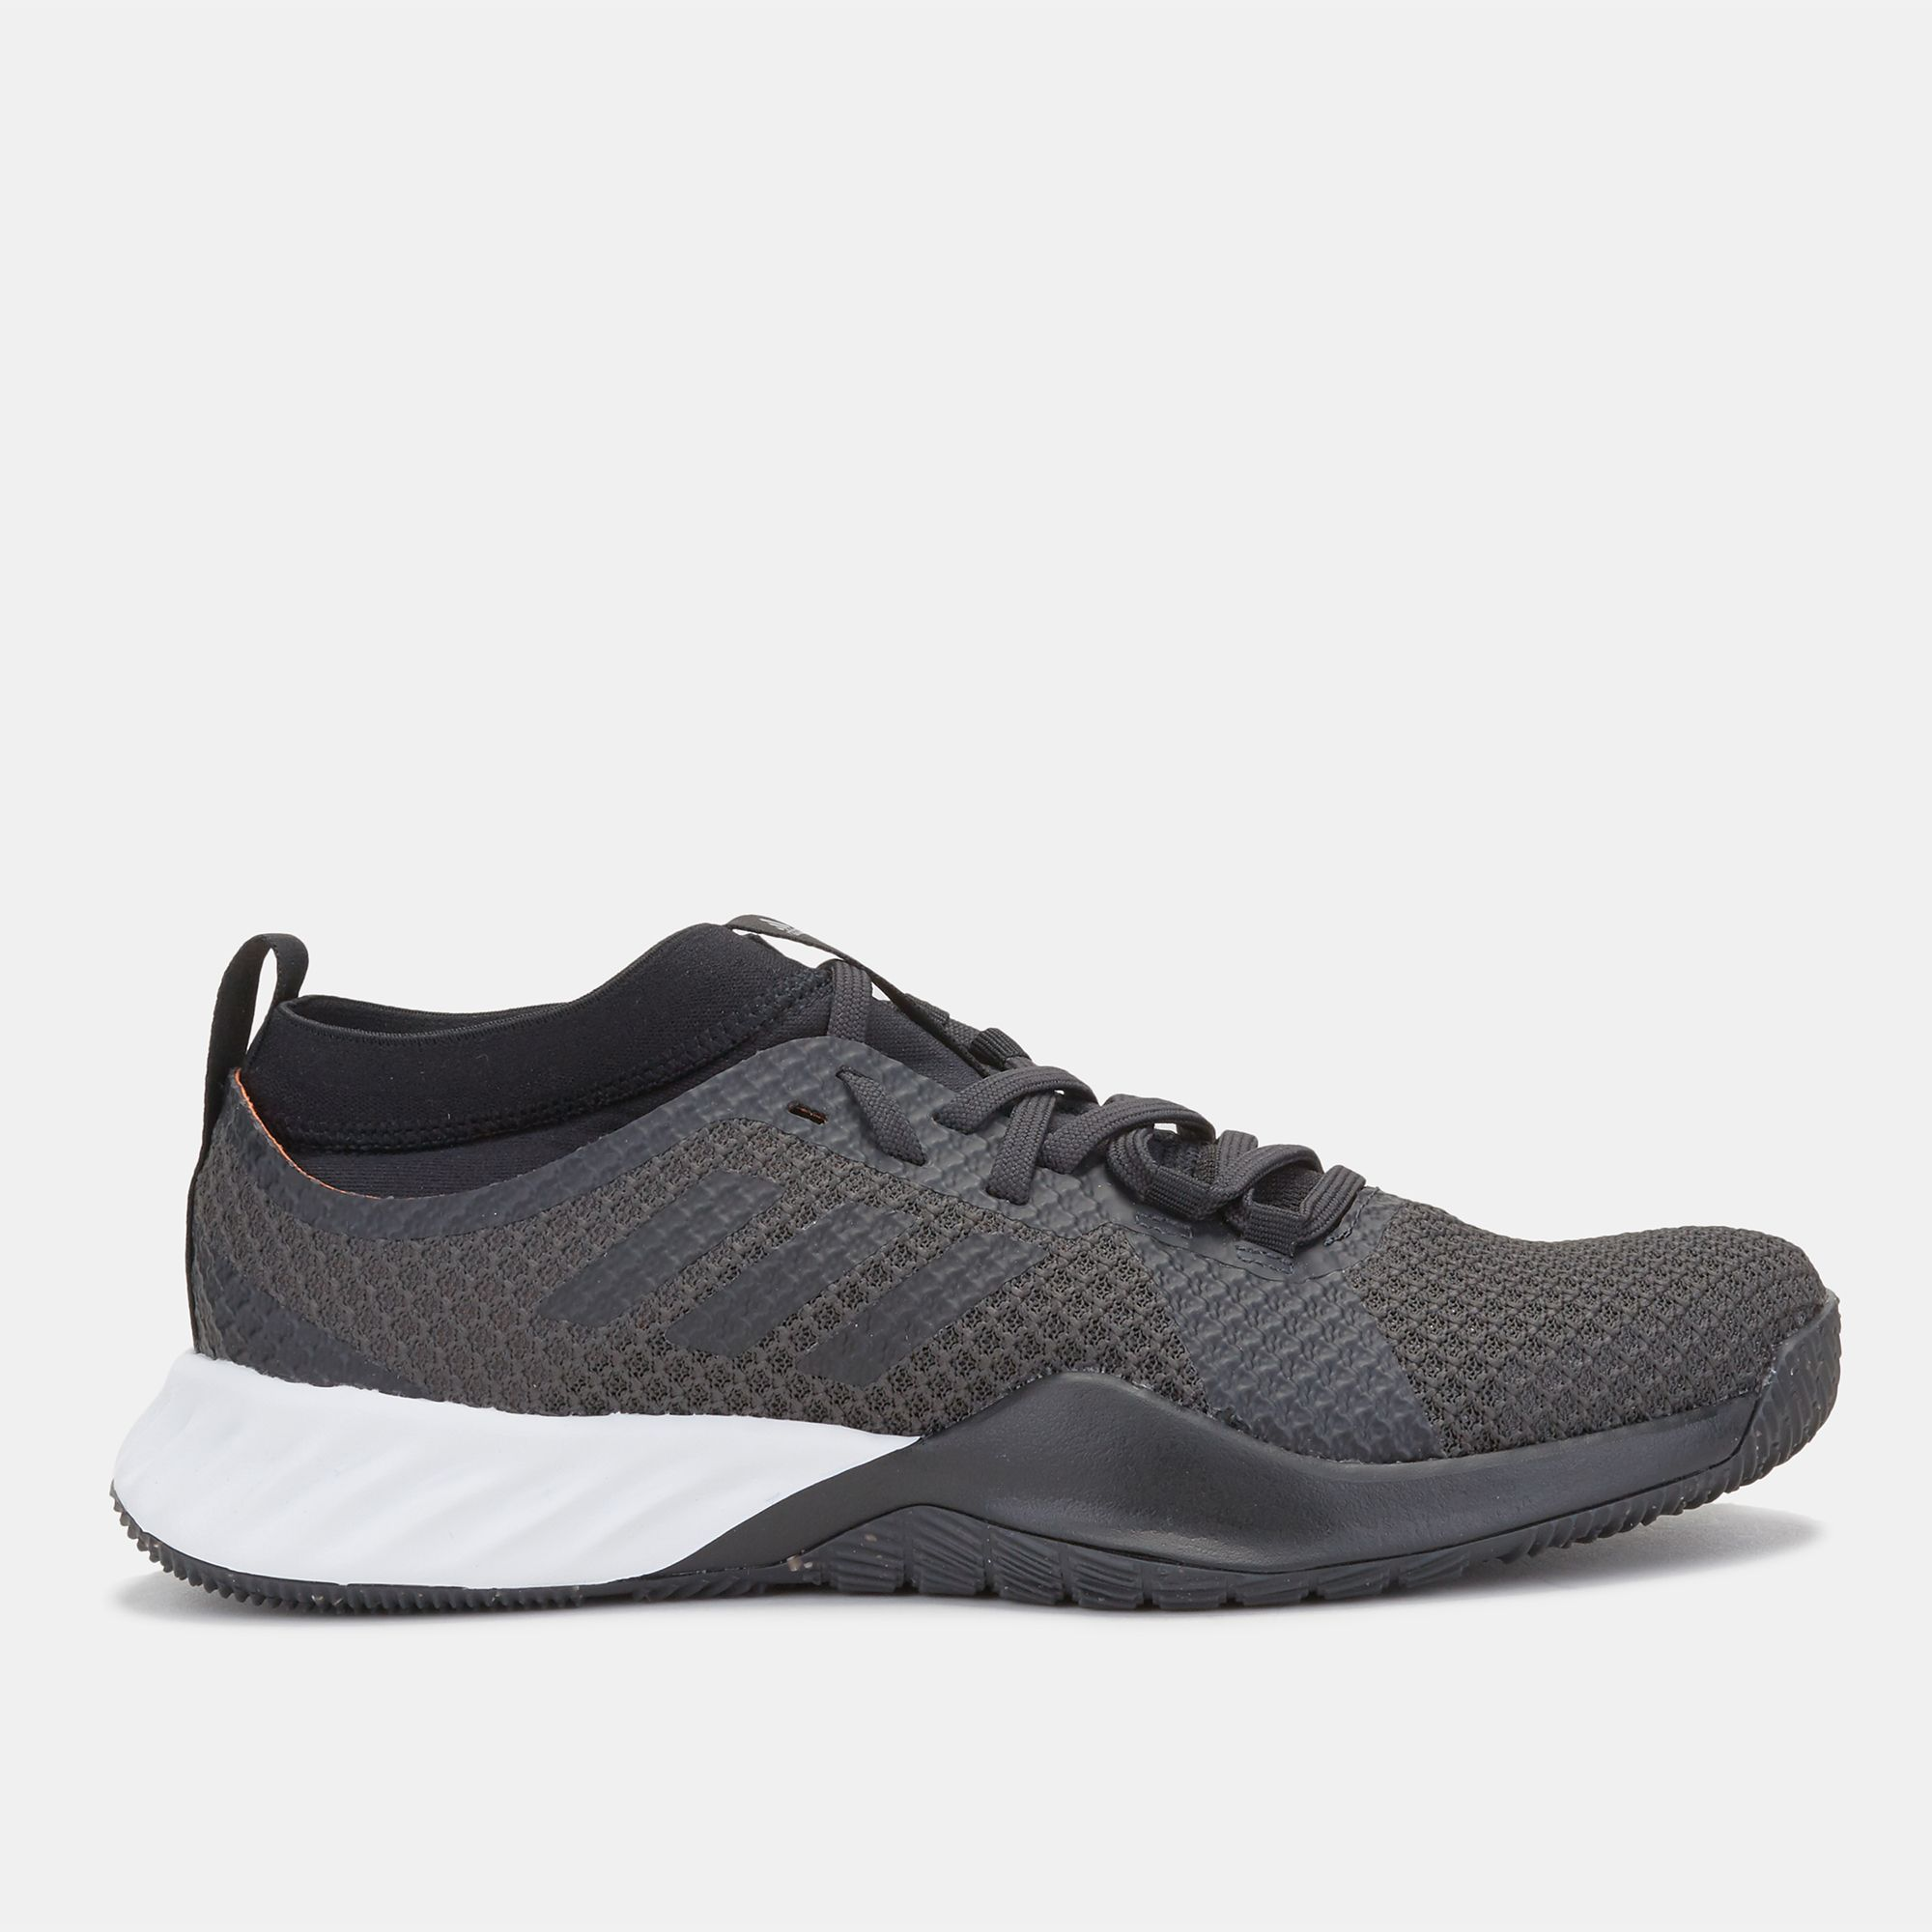 Shop Black adidas CrazyTrain Pro 3.0 Training Shoe for